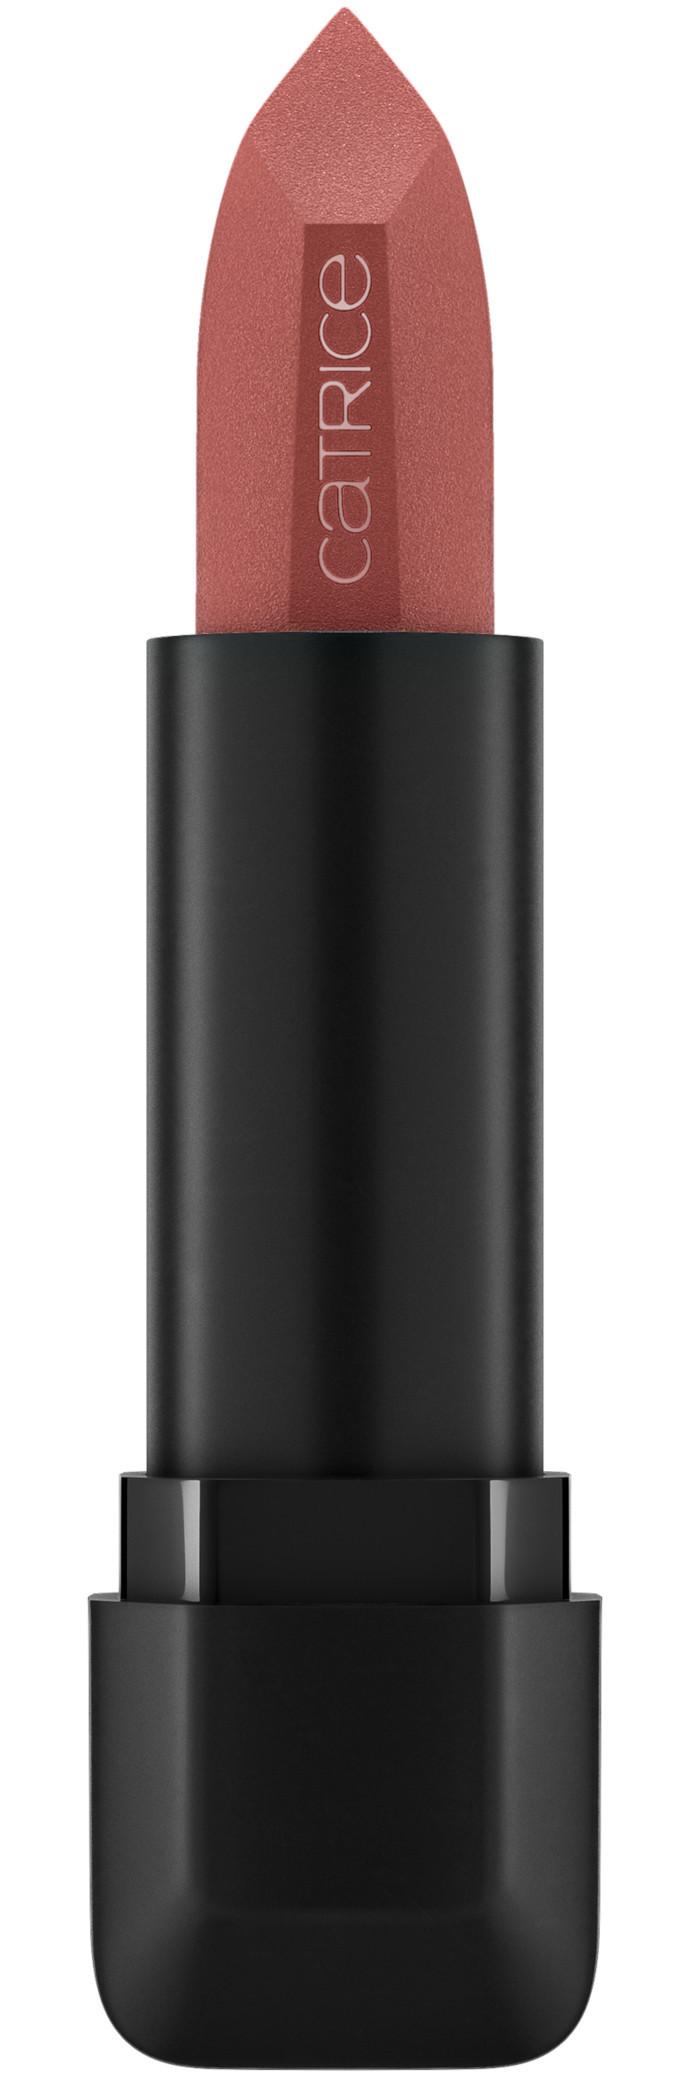 Catrice Demi Matt Lipstick in Warm Sandstone